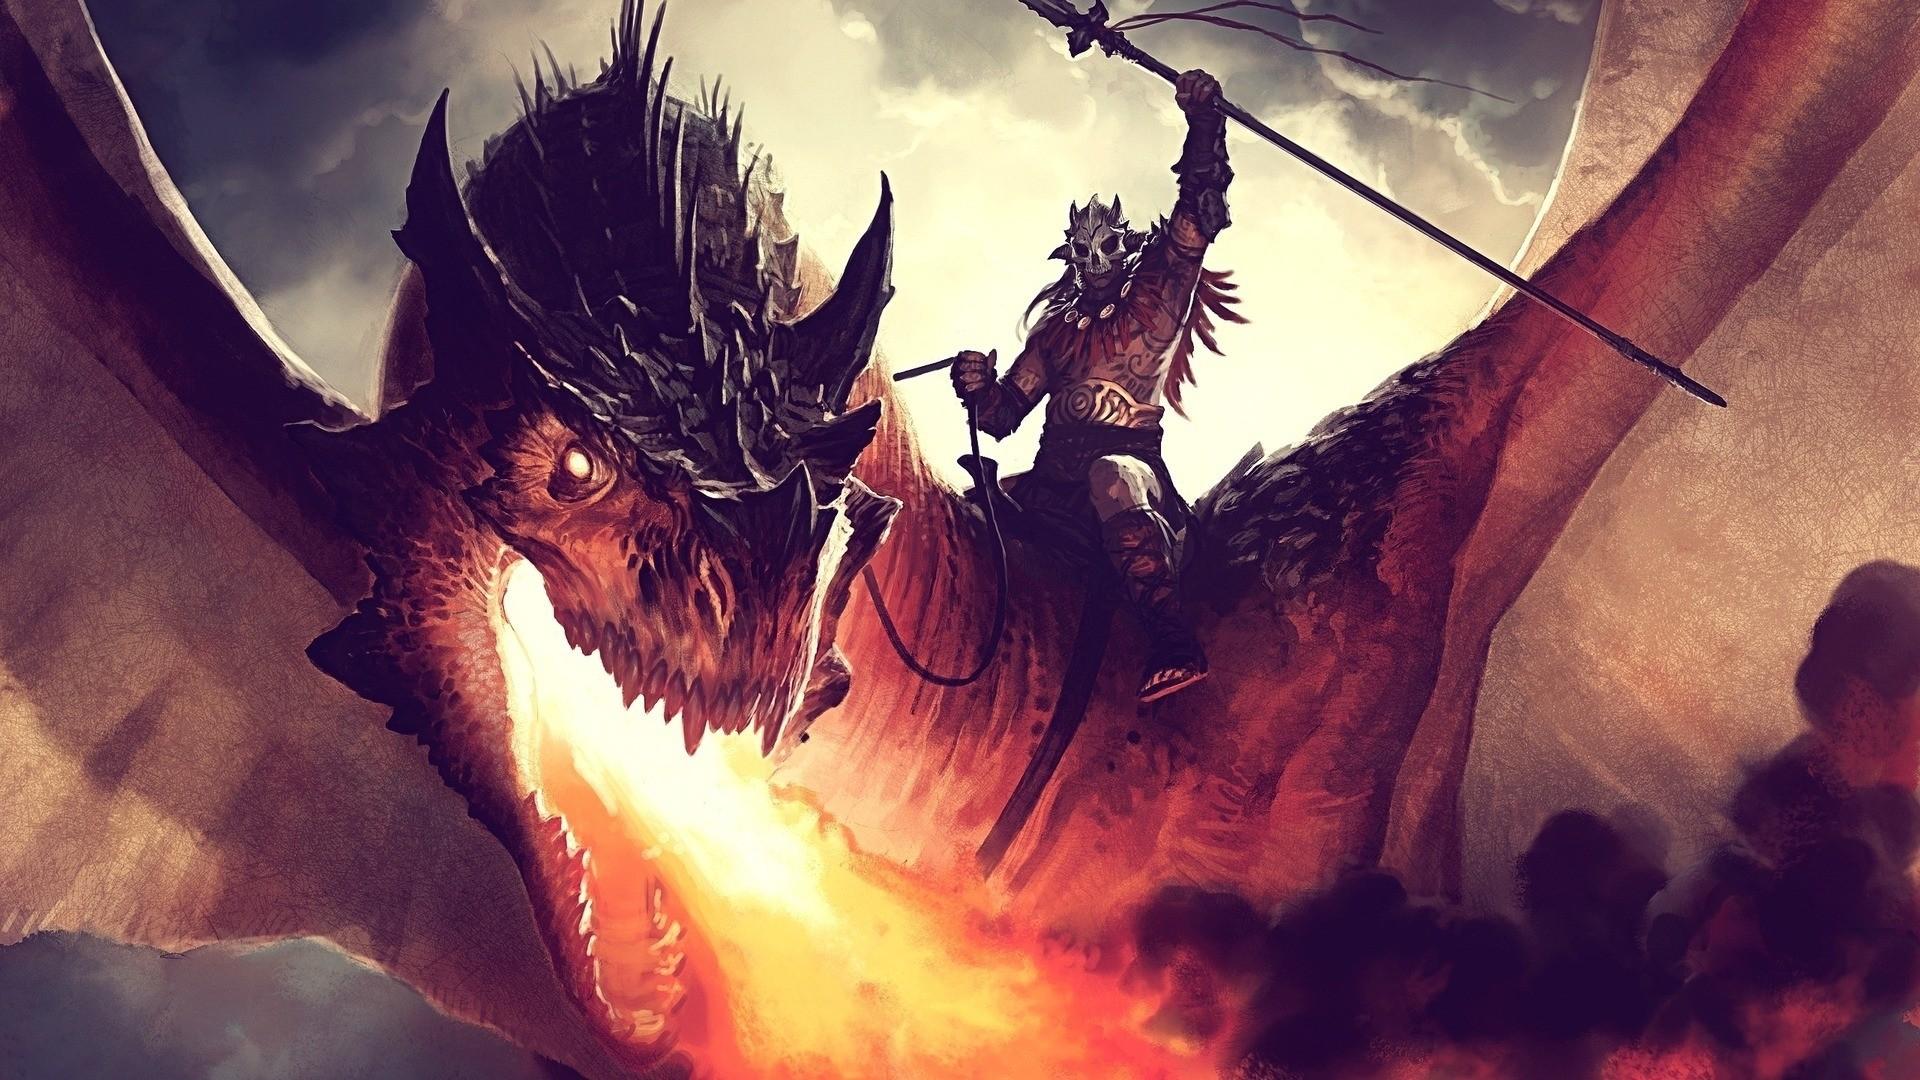 Magic The Gathering Dragon Wallpaper 1920×1080 #21944 HD Wallpaper .